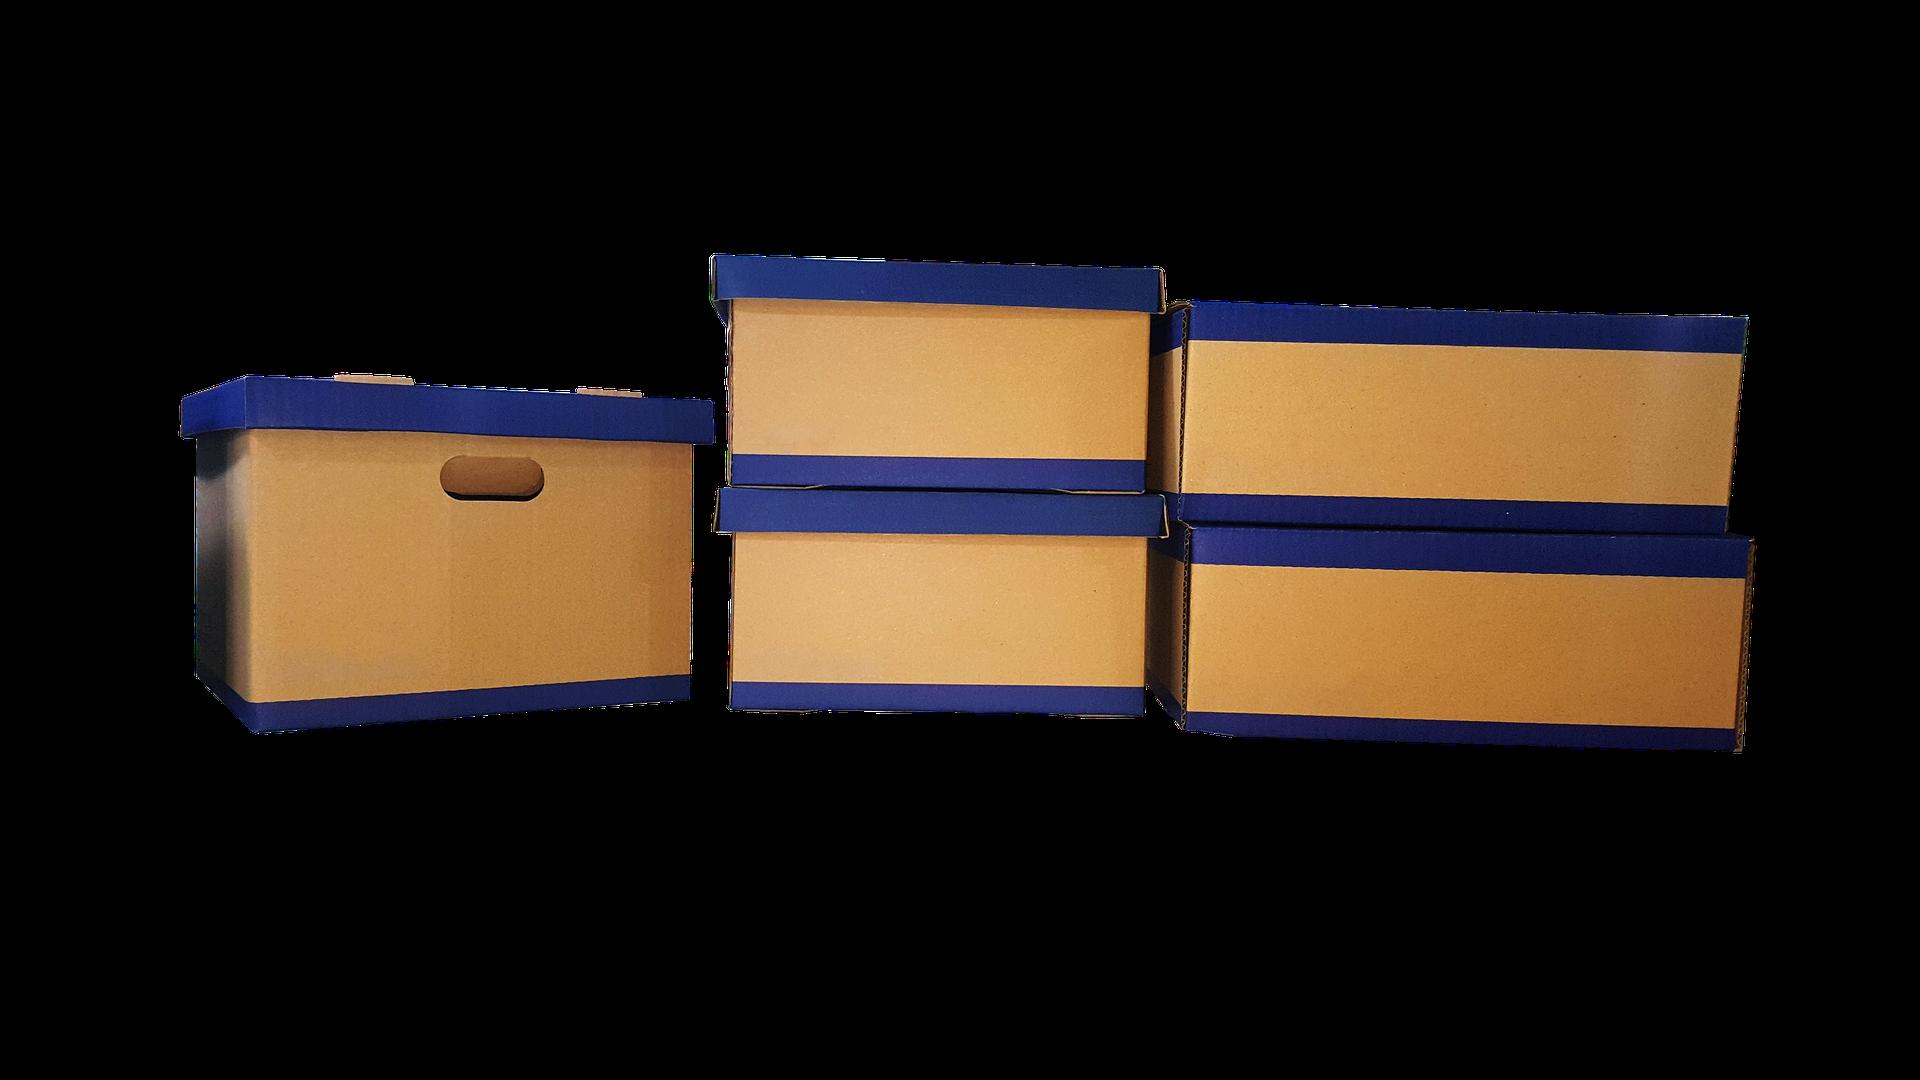 box-2507269_1920